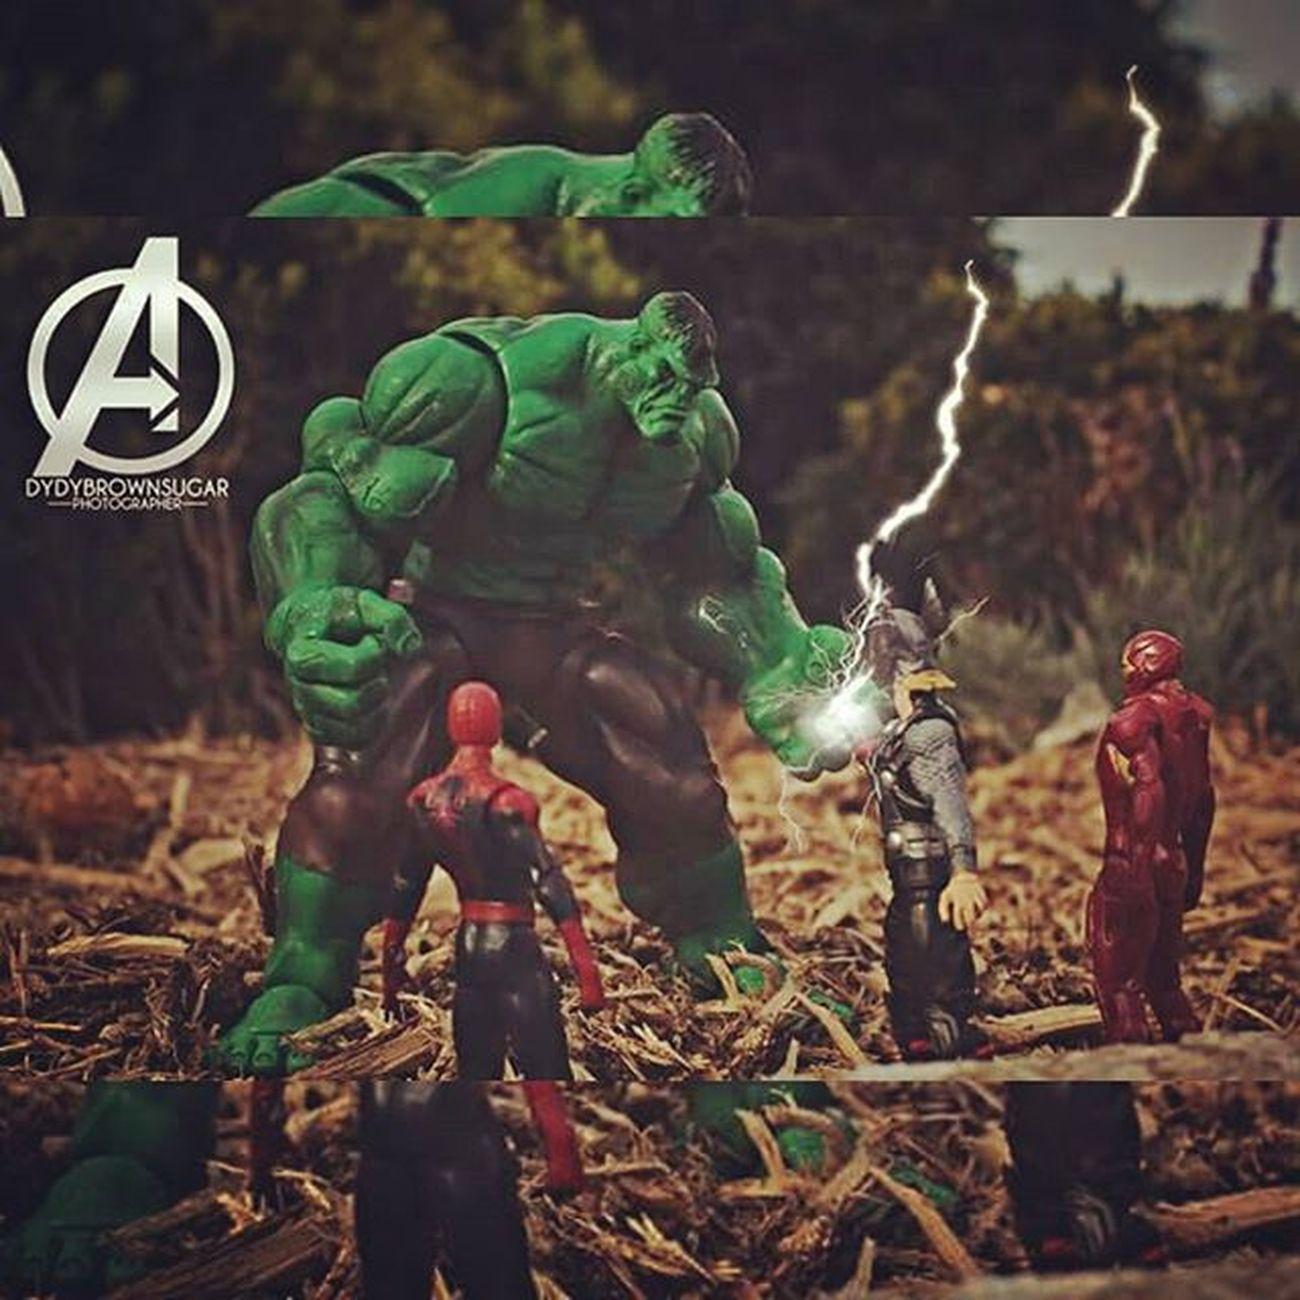 Dydy Dydybrownsugar Originalprodige Photo Photographer Photographe Photographie  Marvel Marvelcomics Comics Hulk IncredibleHulk Spiderman Theamezingspiderman Ironman Thor